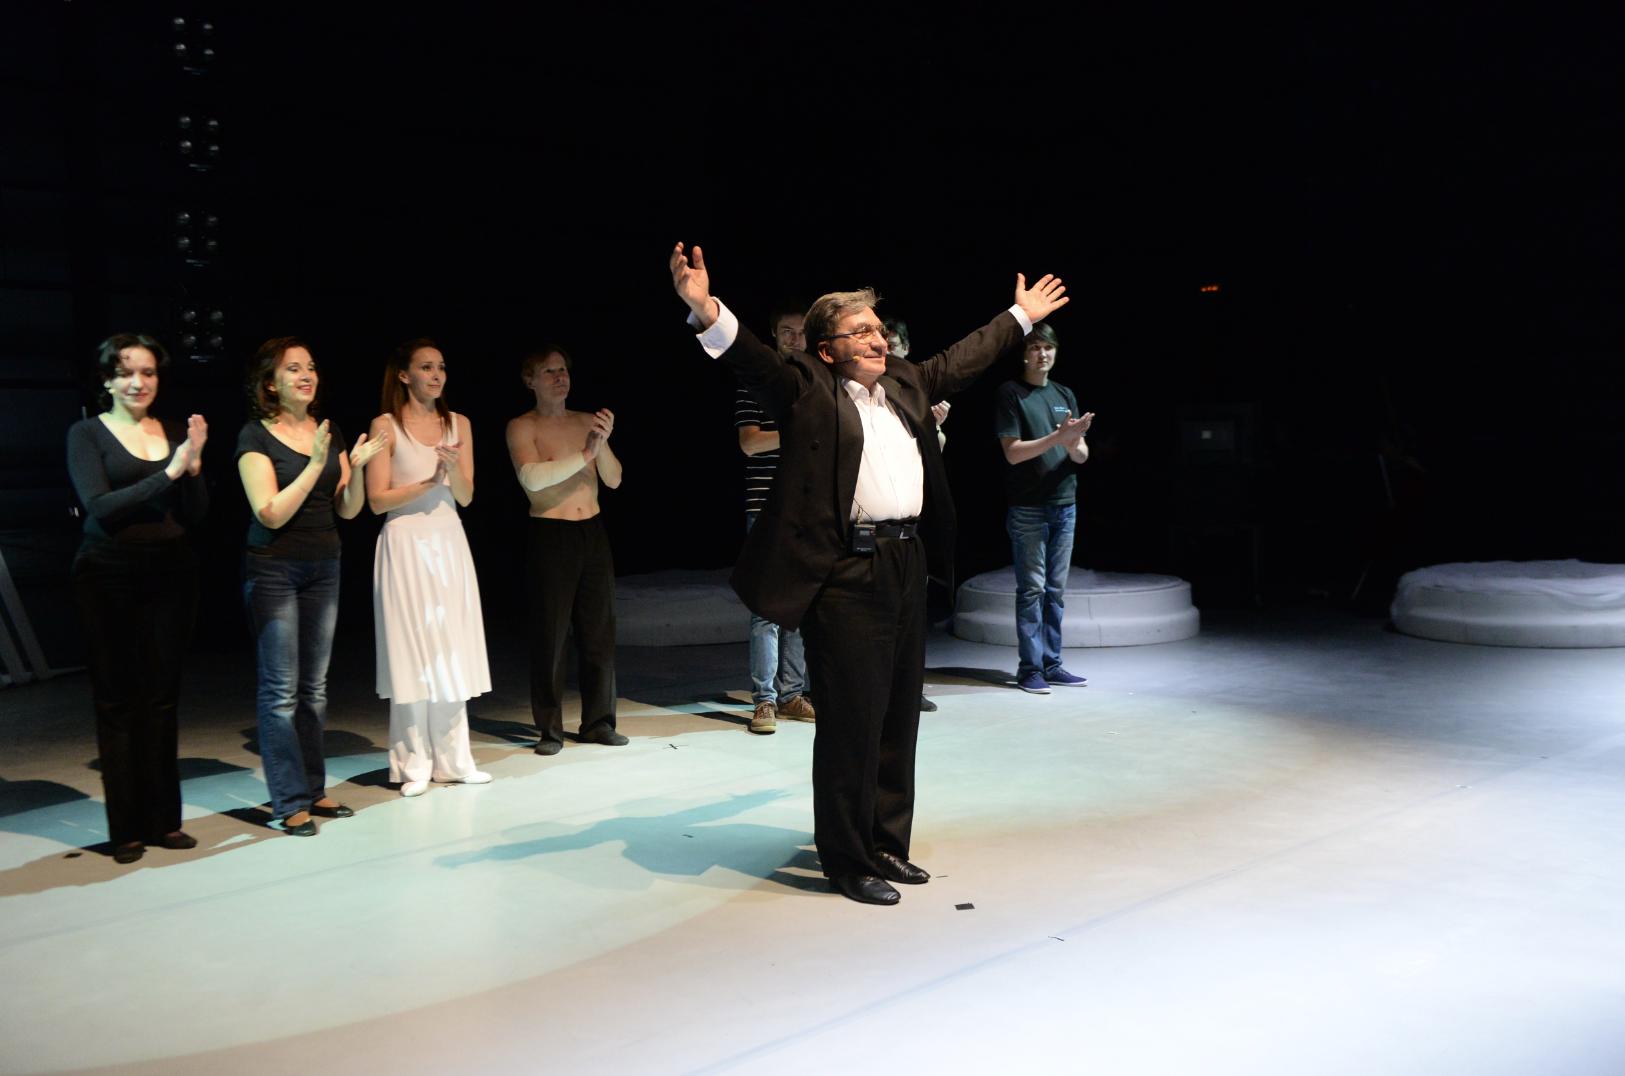 Театр Станиславского оказался «По ту сторону тени»